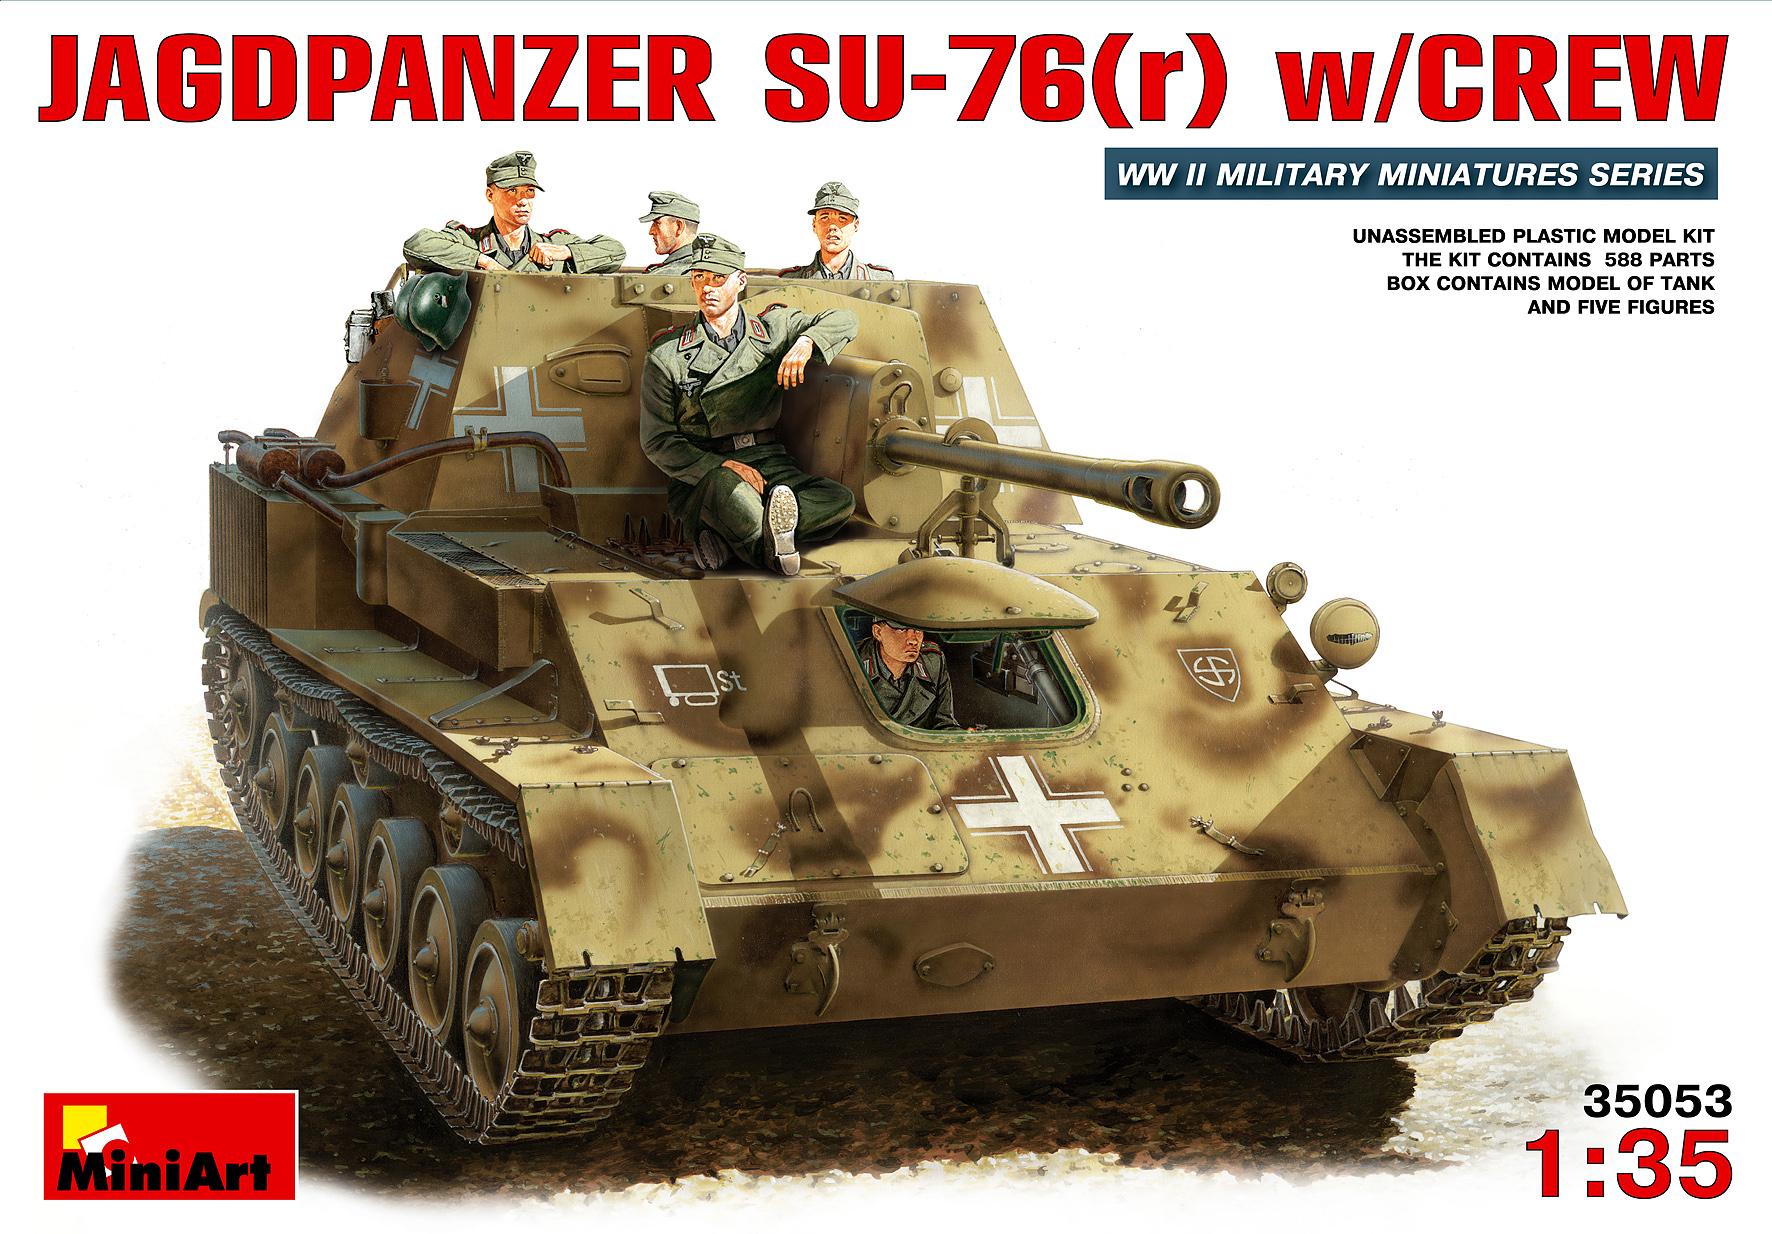 JAGDPANZER SU-76(r) w/CREW